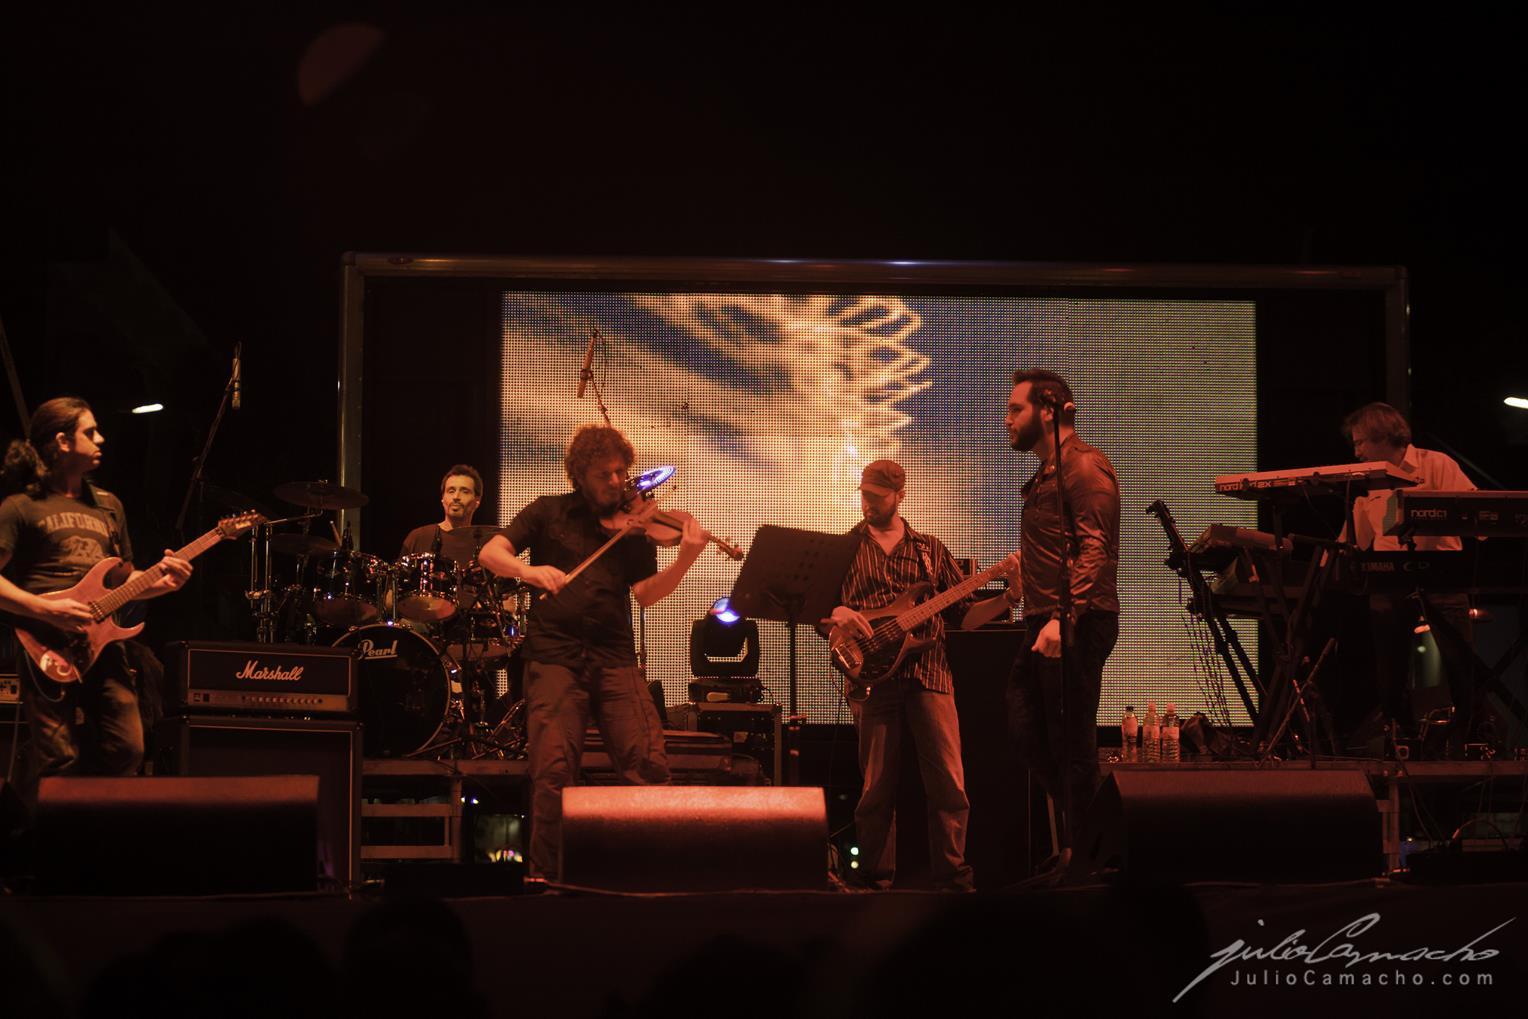 2014-10-30 31 CAST TOUR Ensenada y Tijuana - 1396 - www.Juli (Copy).jpg